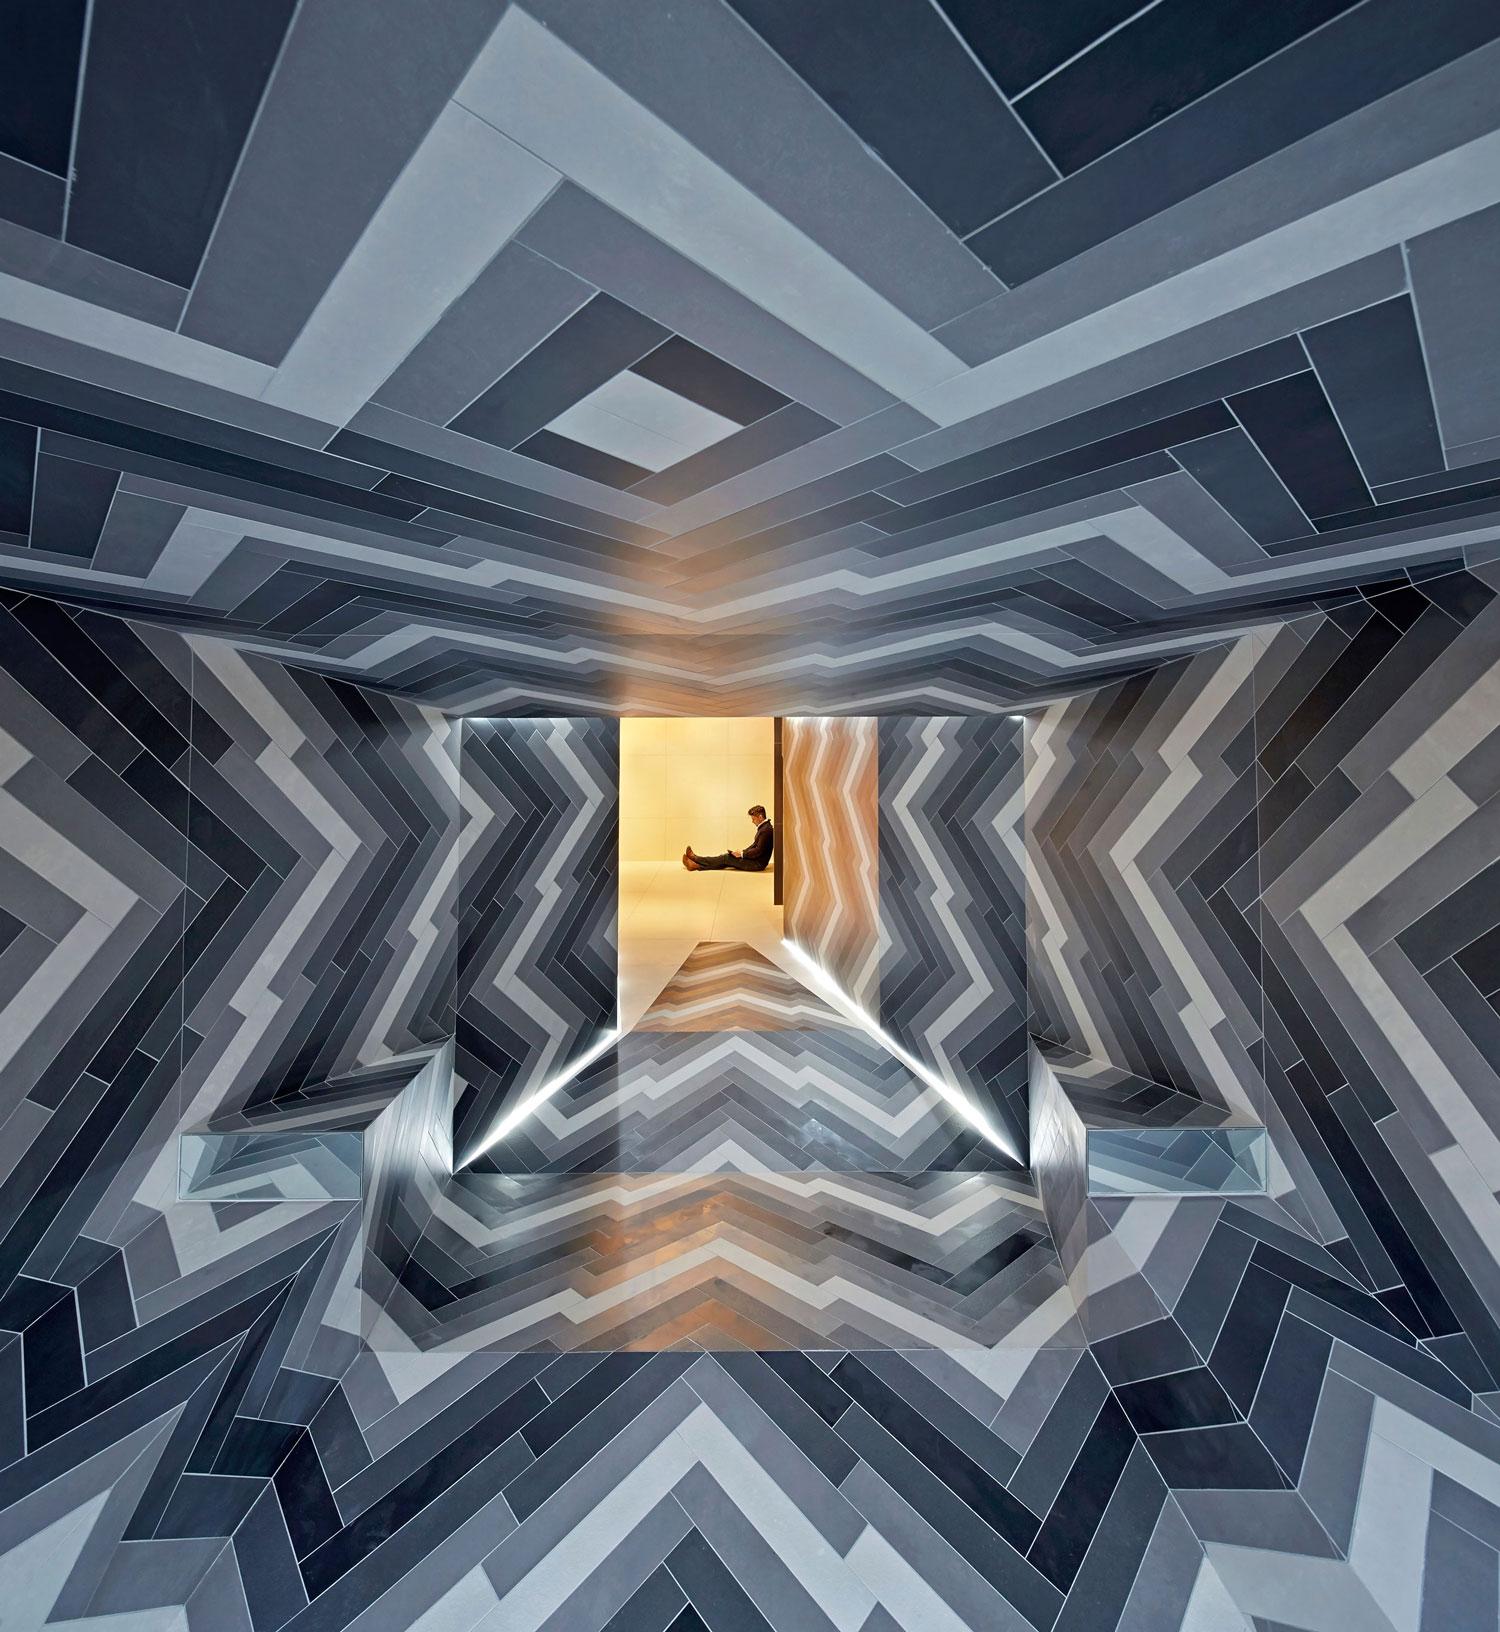 Pulsate installation design by Lily Jencks & Nathanael Dorent at Capitol Designer Studio, London | Yellowtrace